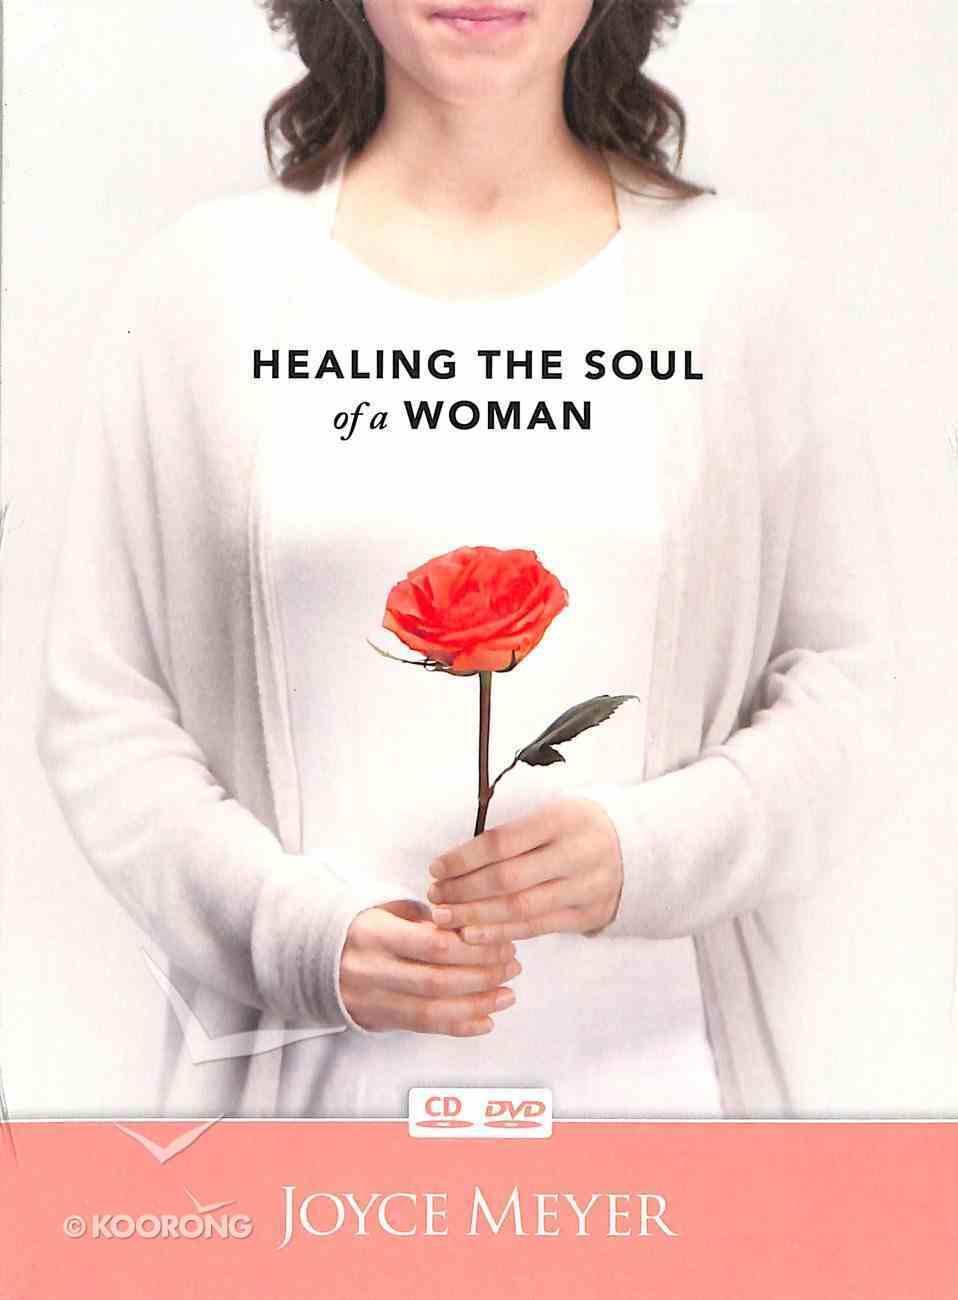 Healing the Soul of a Woman (1 Cd & 1 Dvd - 60mins, Same Teaching) Pack